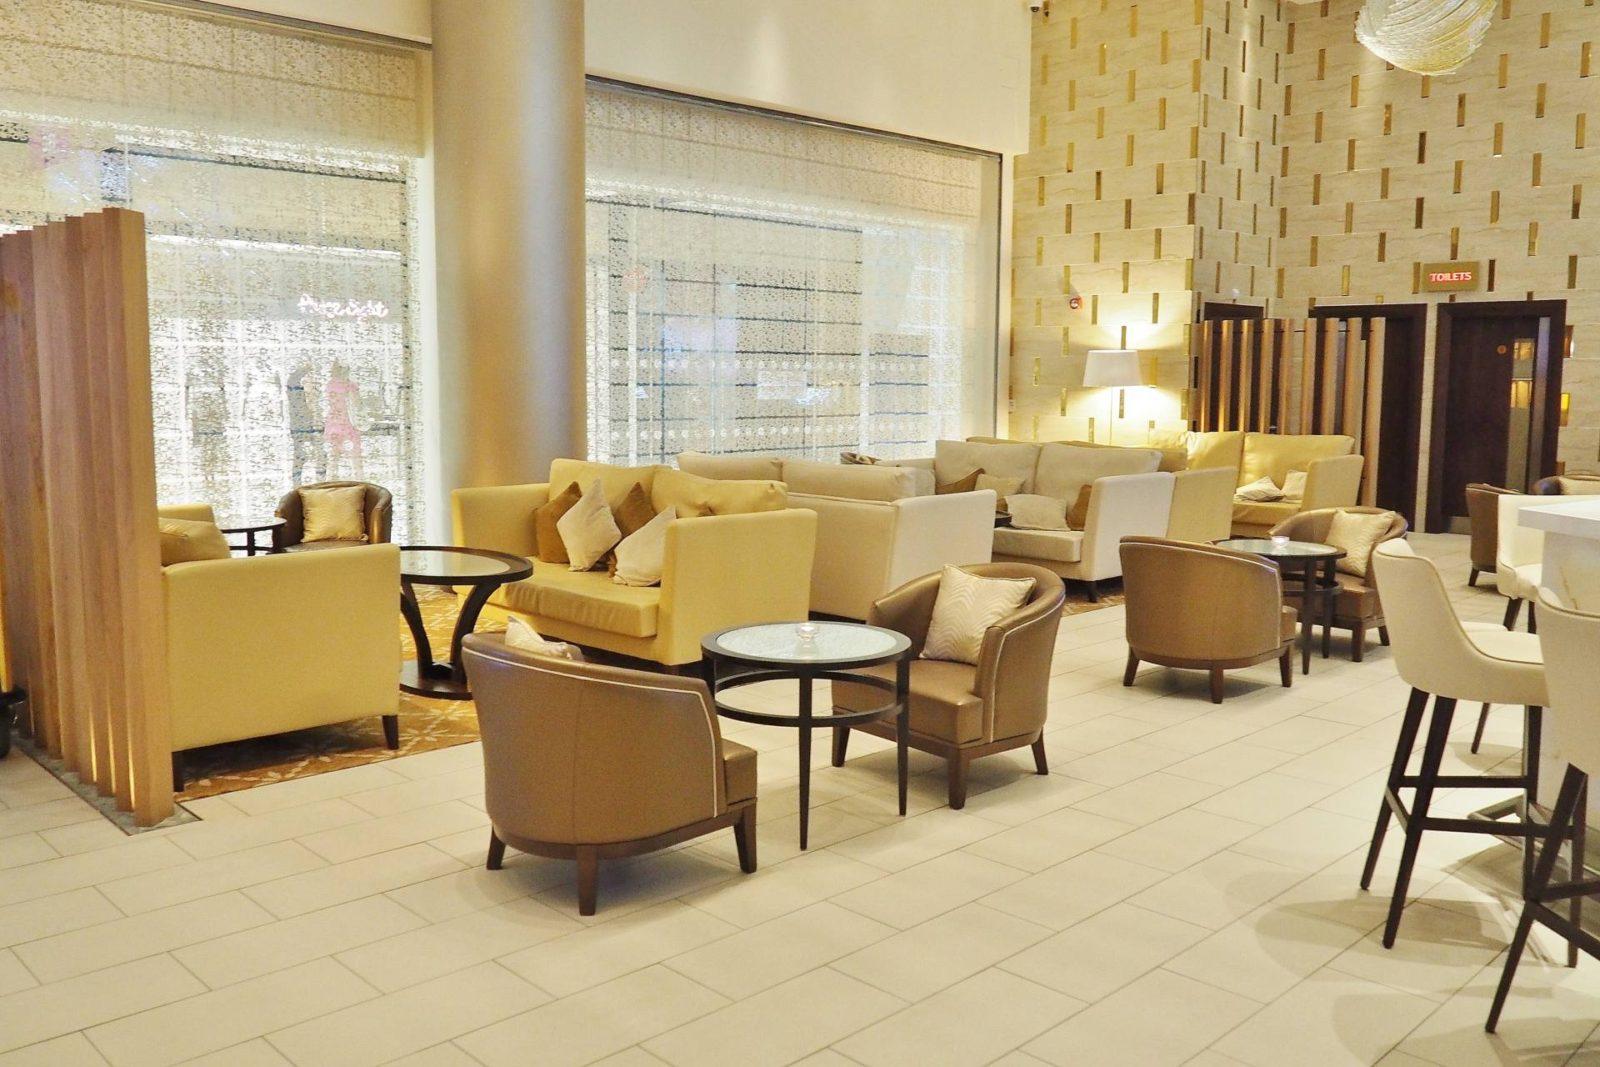 Genting Hotel Lobby